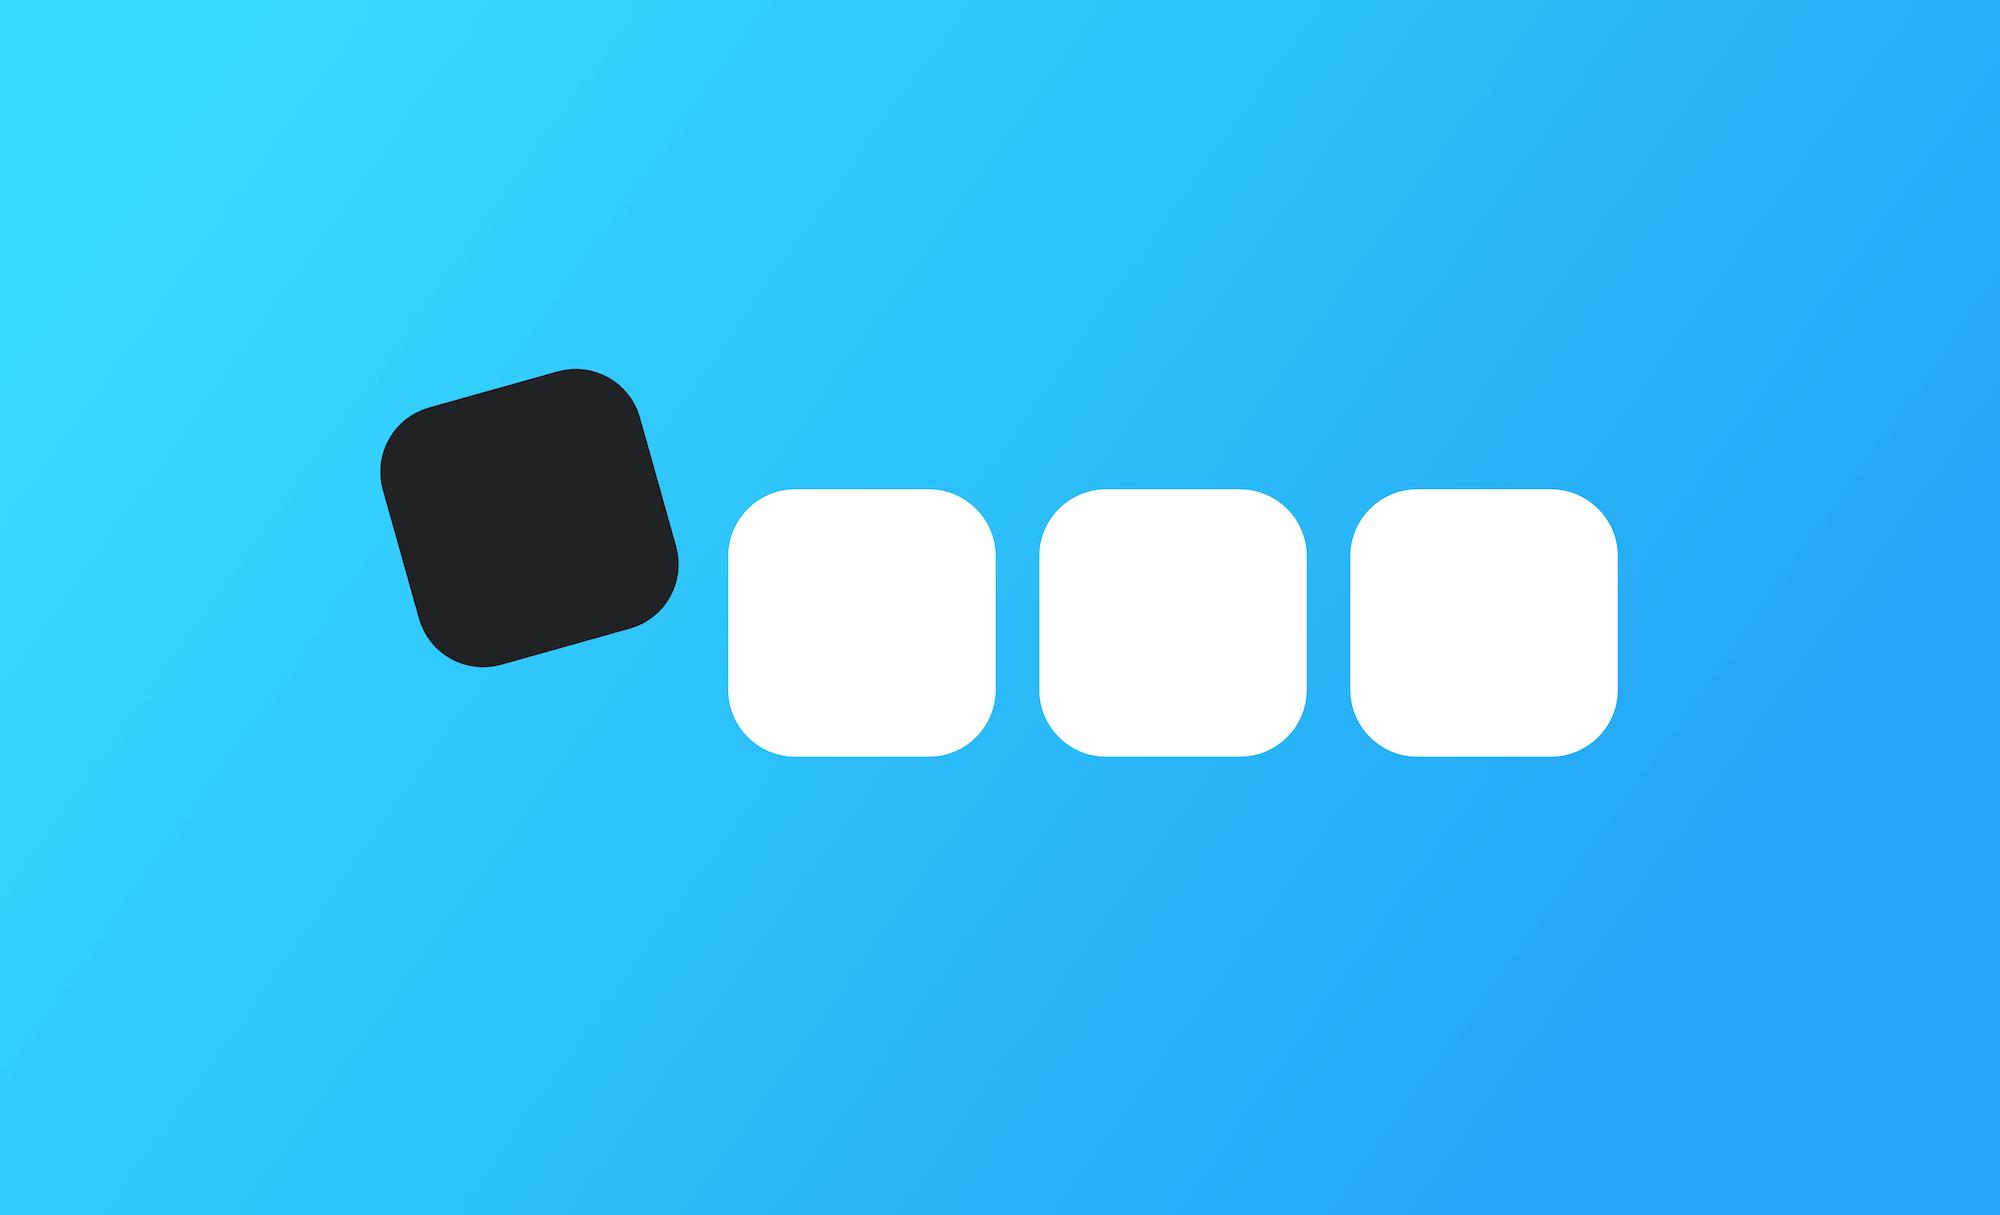 Organising your content